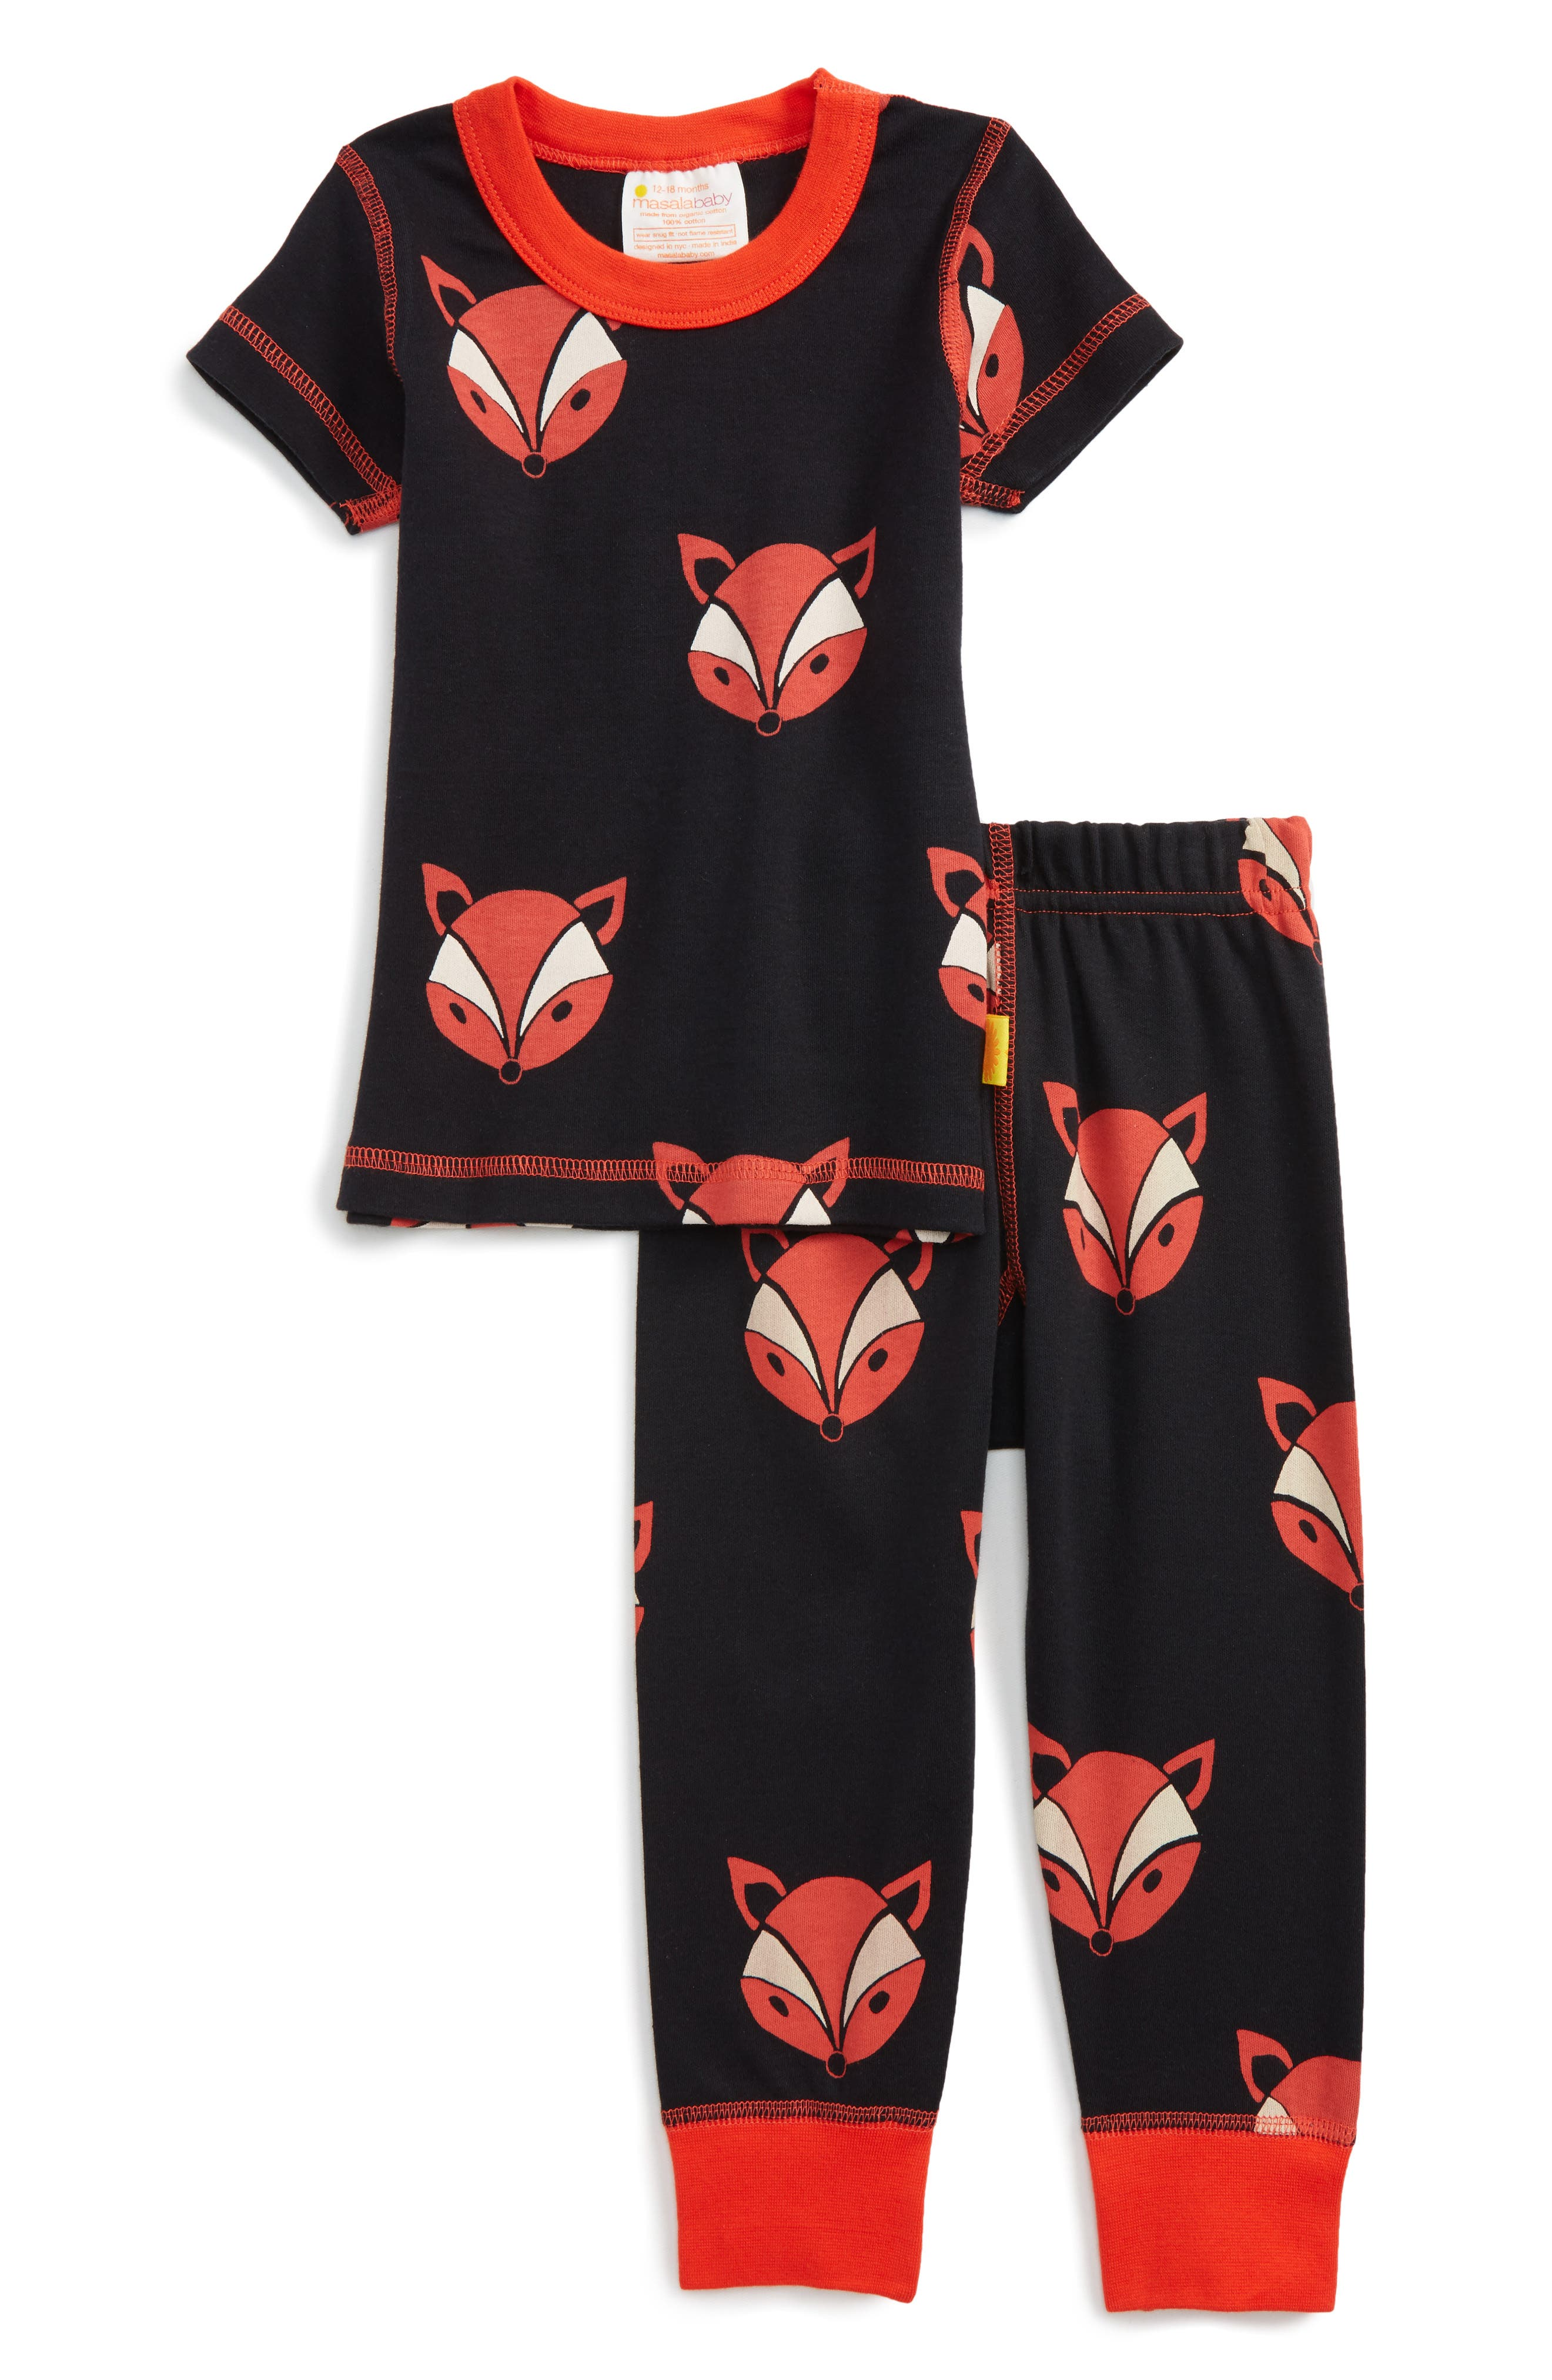 Main Image - Masasla Baby Fox Organic Cotton Fitted Two-Piece Pajamas (Baby)